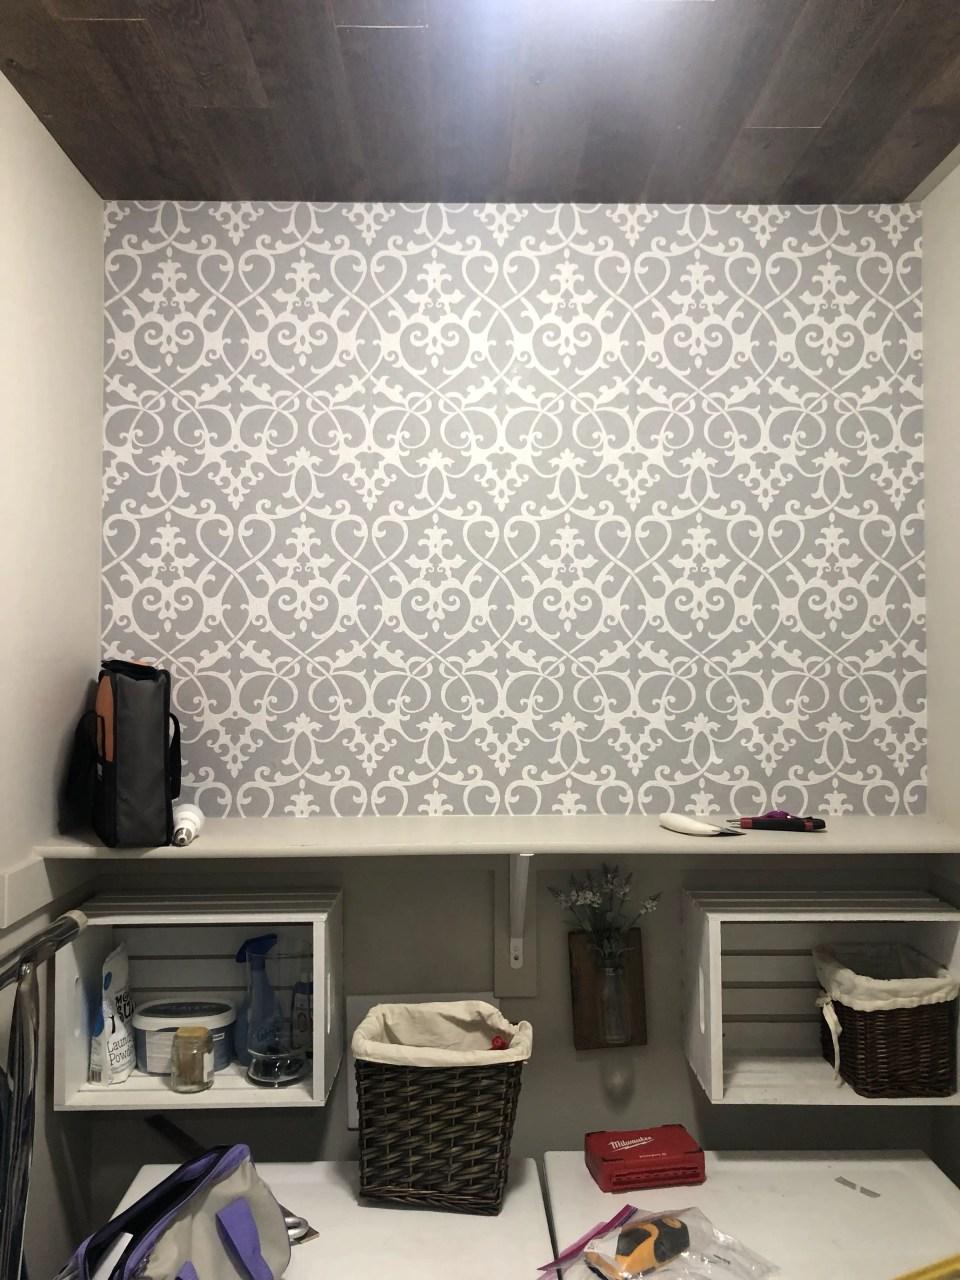 Roll Wallpaper Peel and Stick Removable Let it Snow Wallpaper DeLazurGoods Wall Art Woven Wallpaper